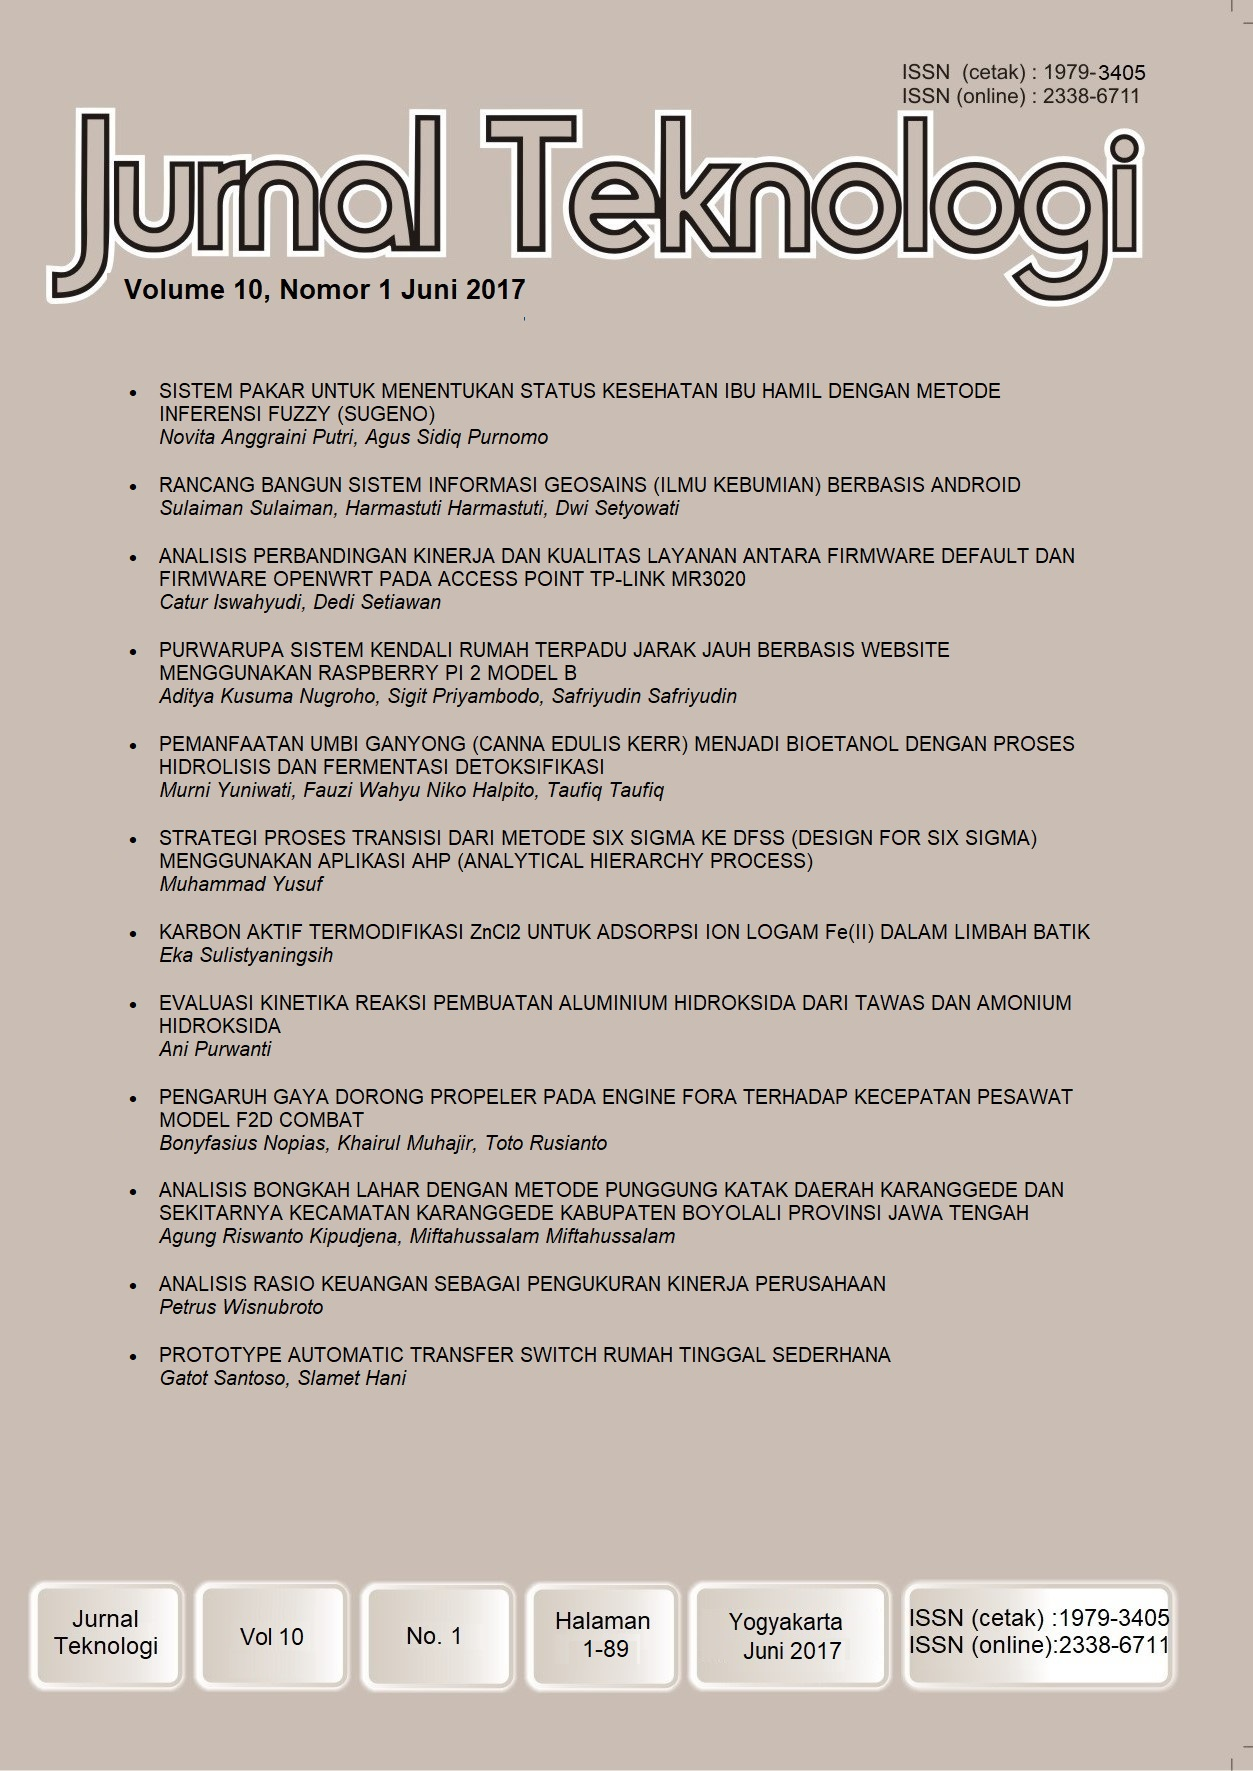 Jurnal Teknologi Volume 10 Nomor 1 Juni 2017